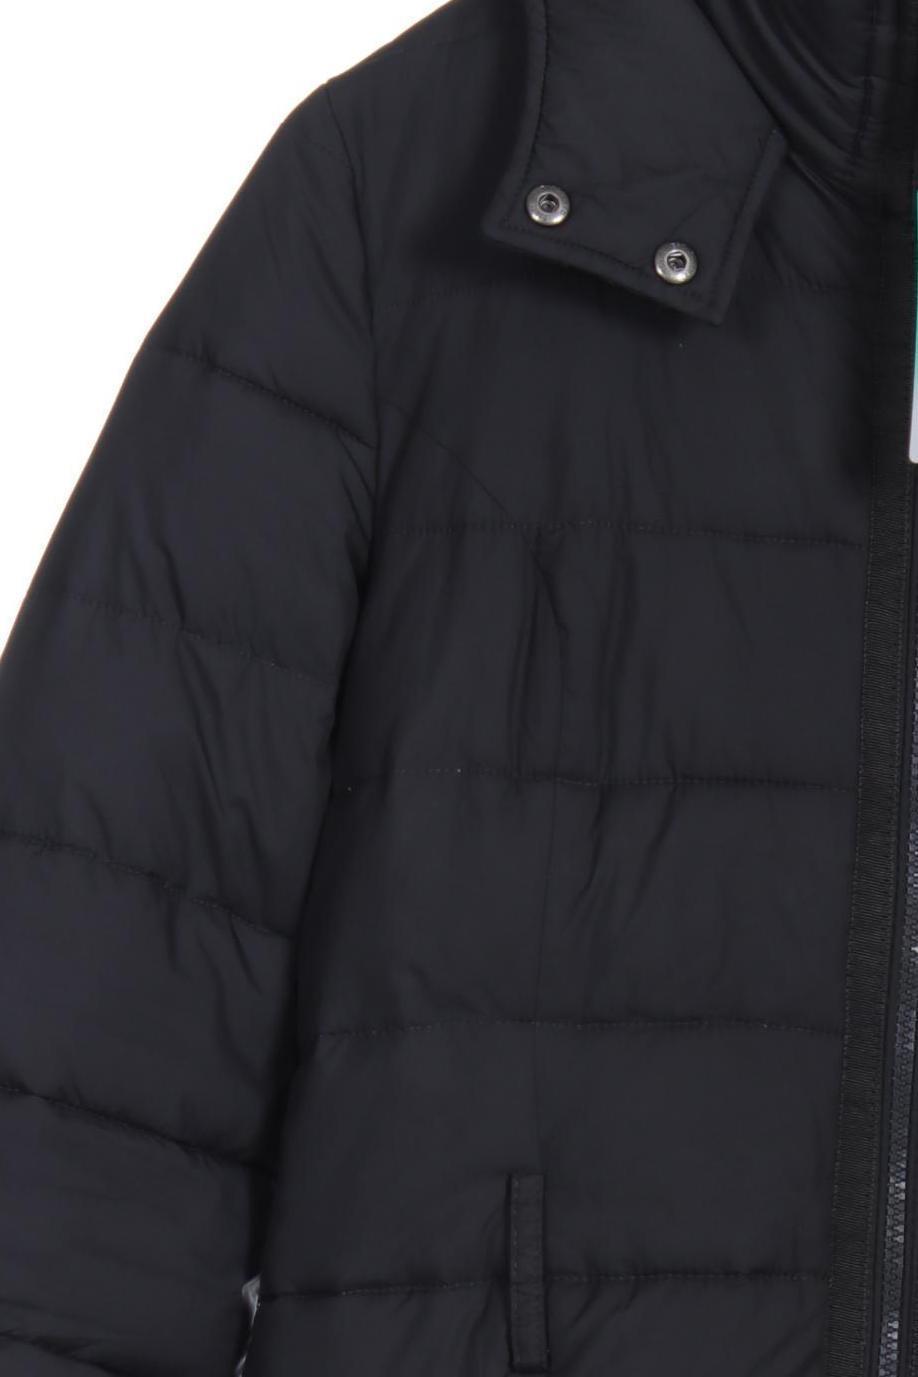 Abercrombie & Fitch Damen Mantel INT L Second Hand kaufen kAsEl